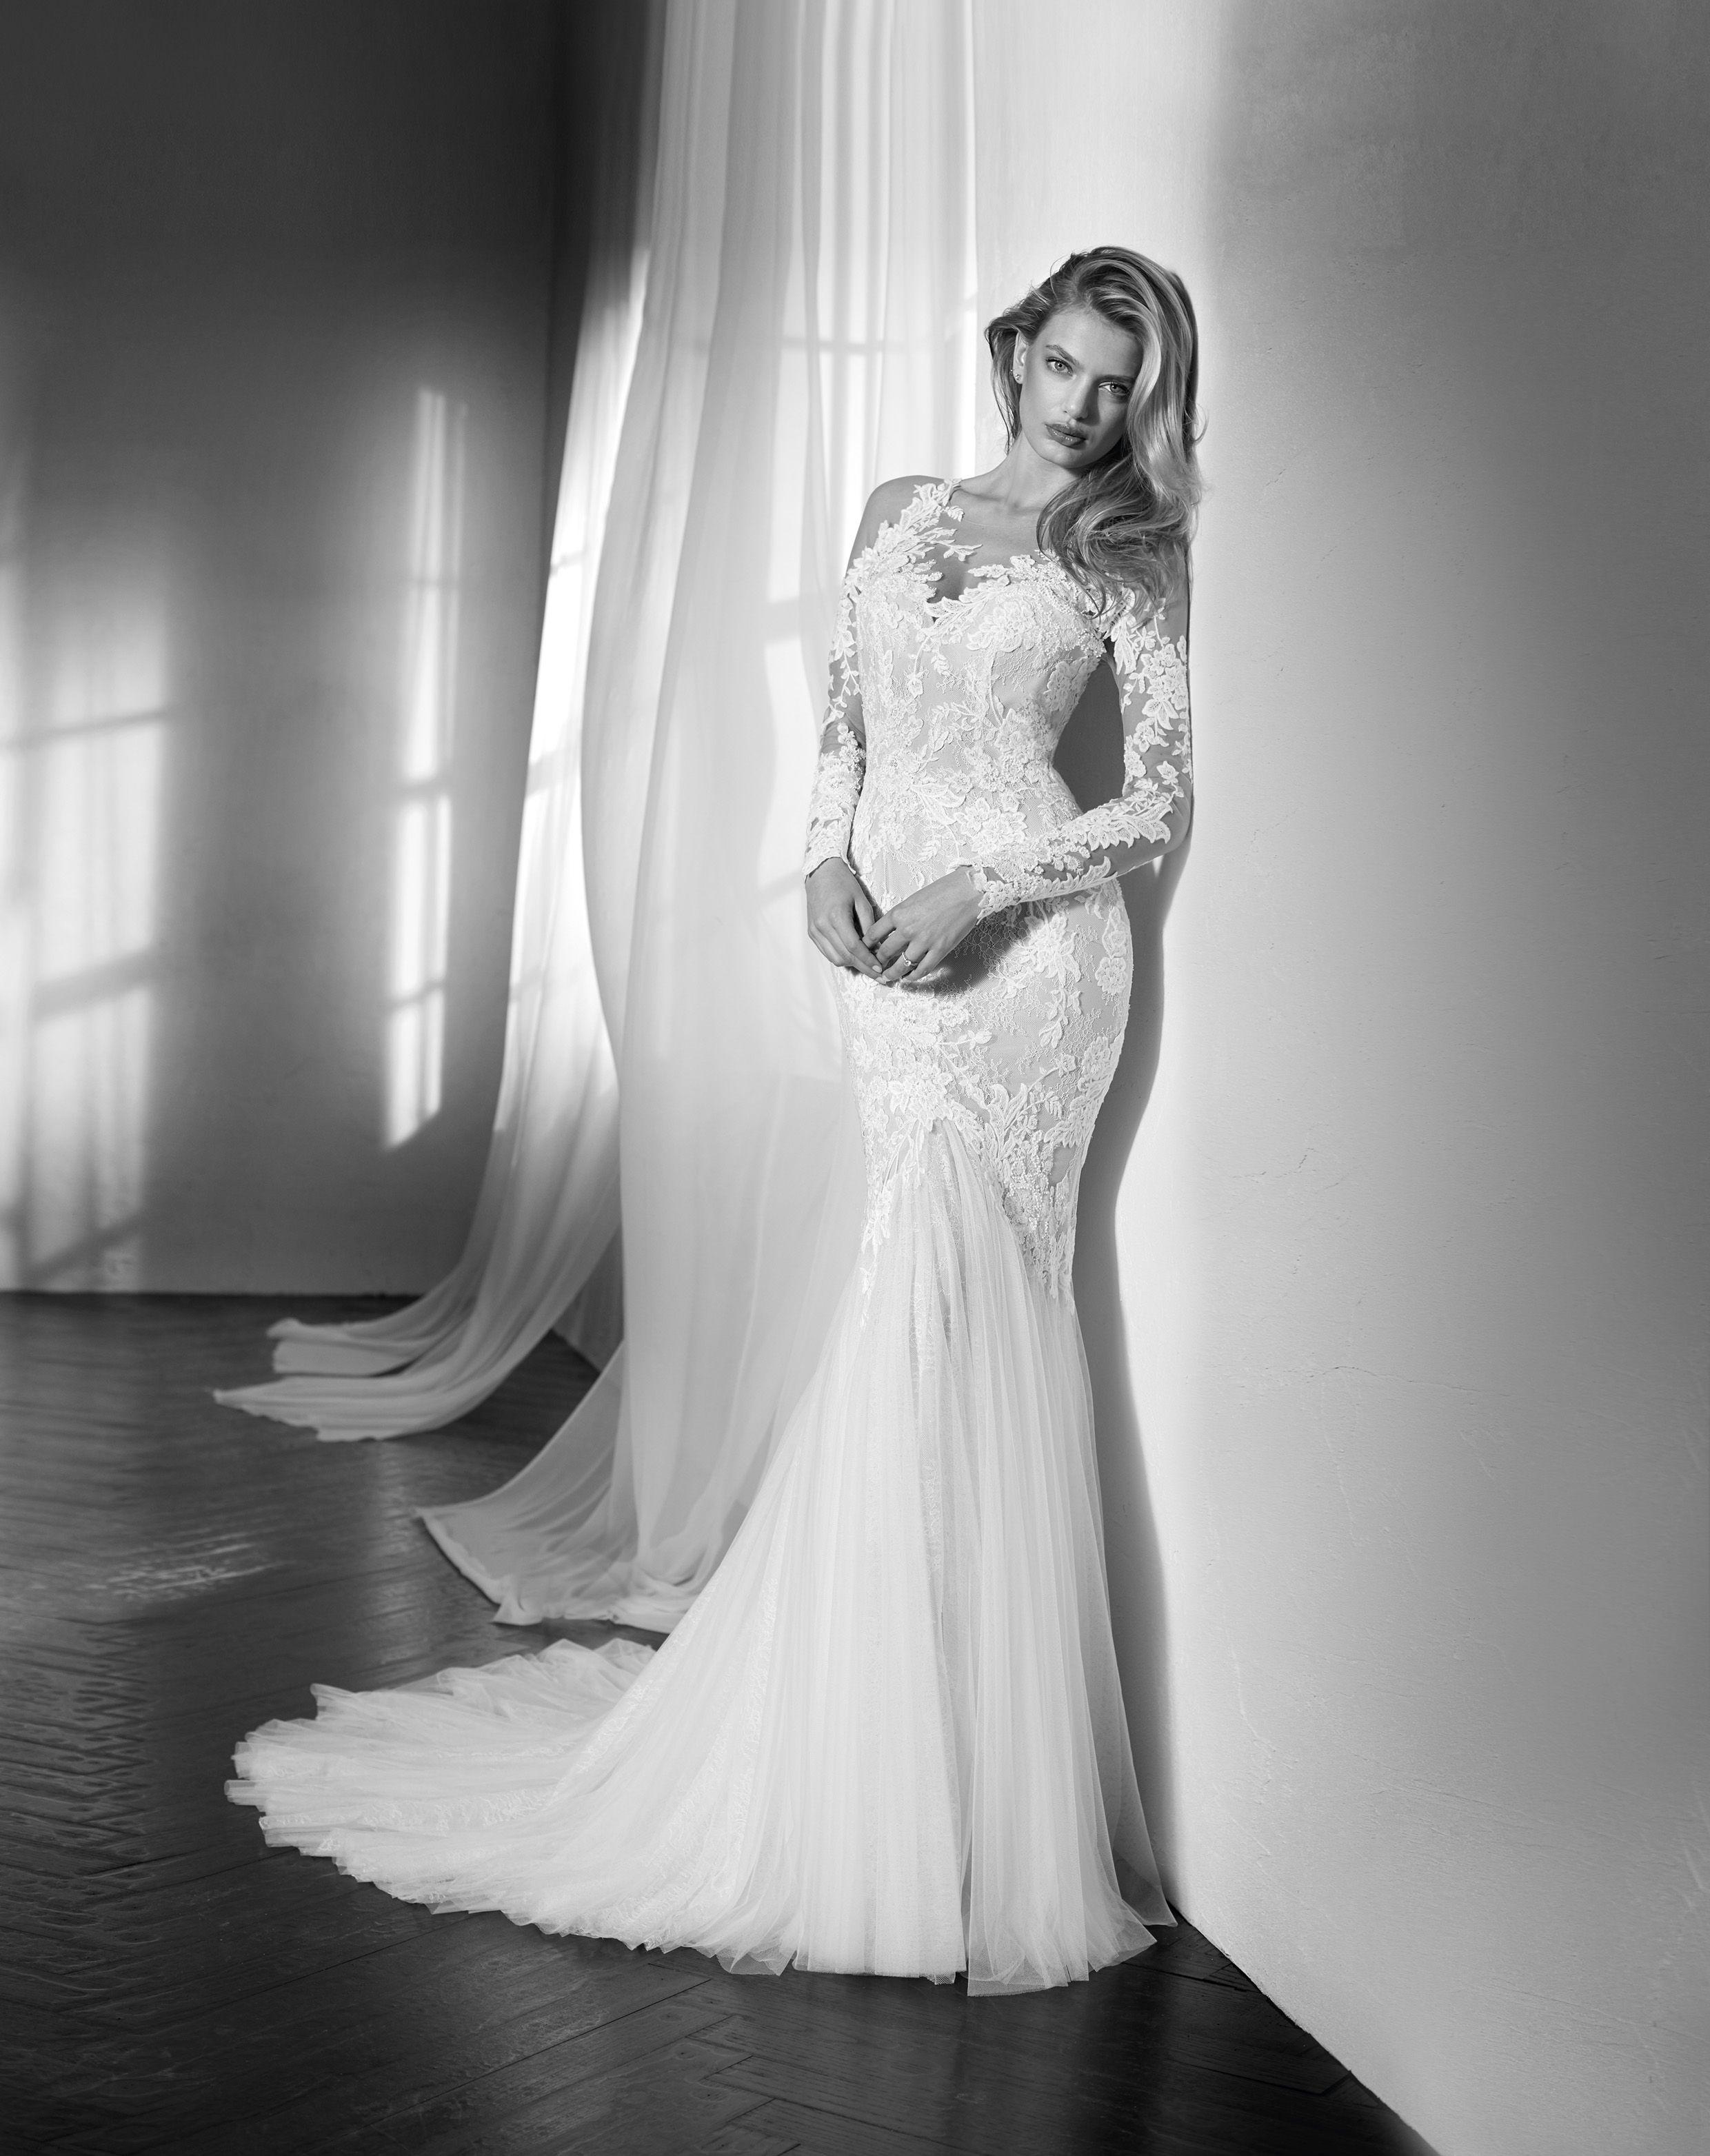 58133716d3fe ZANTE long sleeve fitted mermaid wedding dress st patrick luv bridal  pronovias